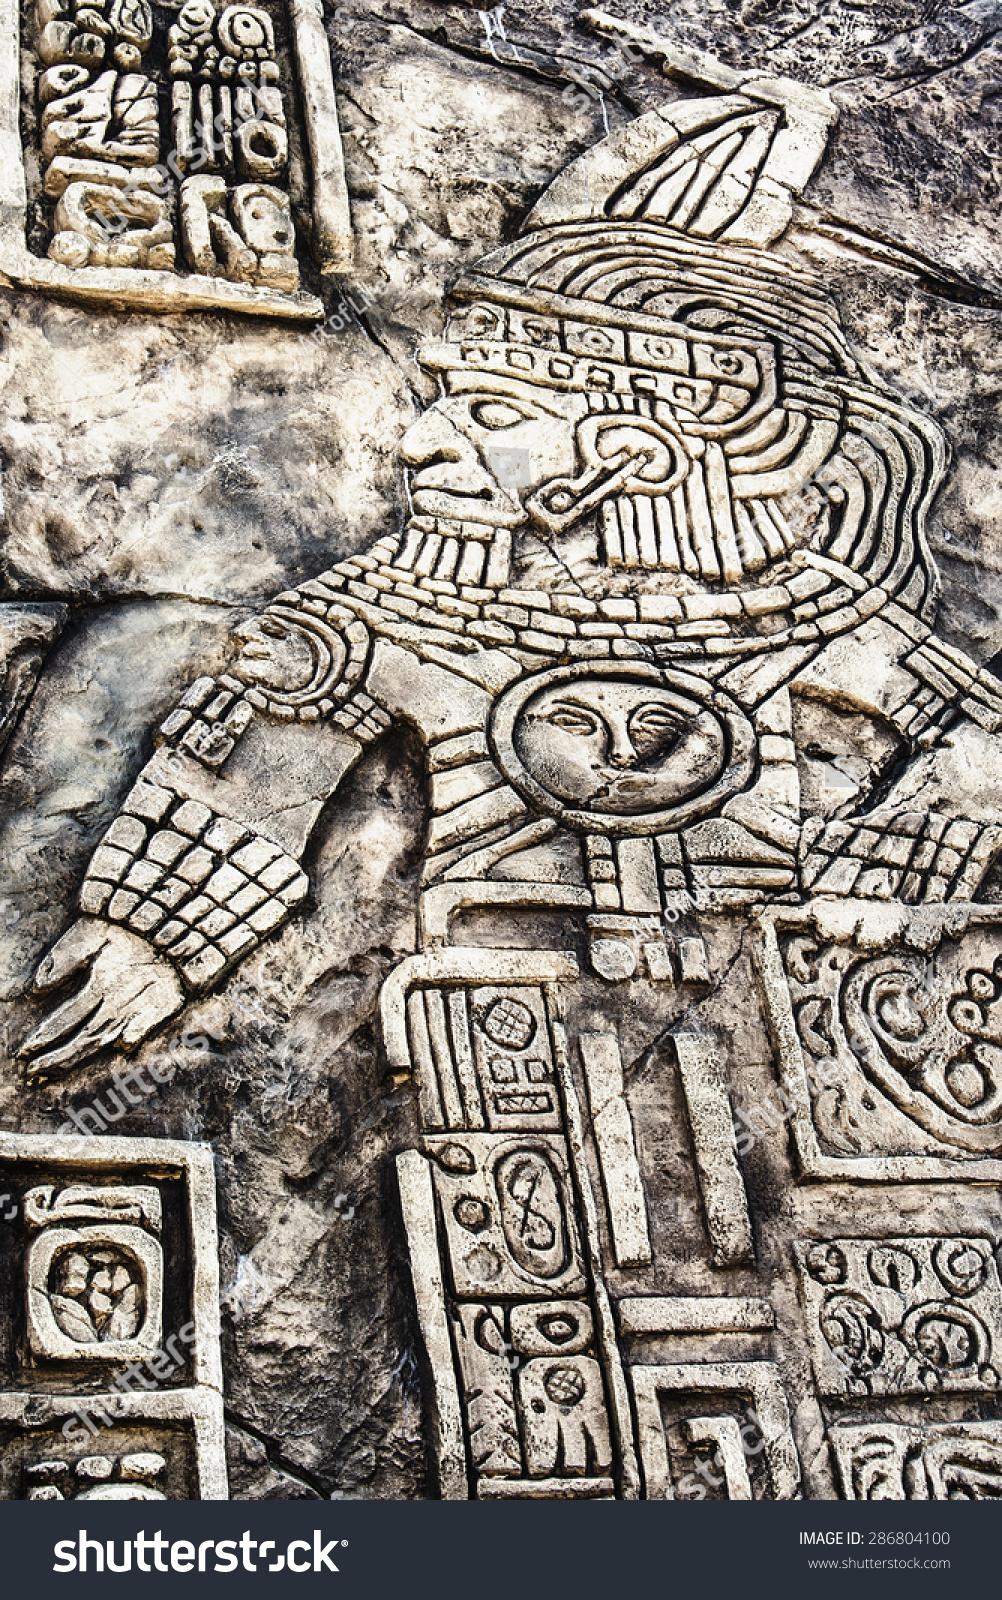 Ancient Mayan Hieroglyphics Stone Ruins Stock Photo 286804100